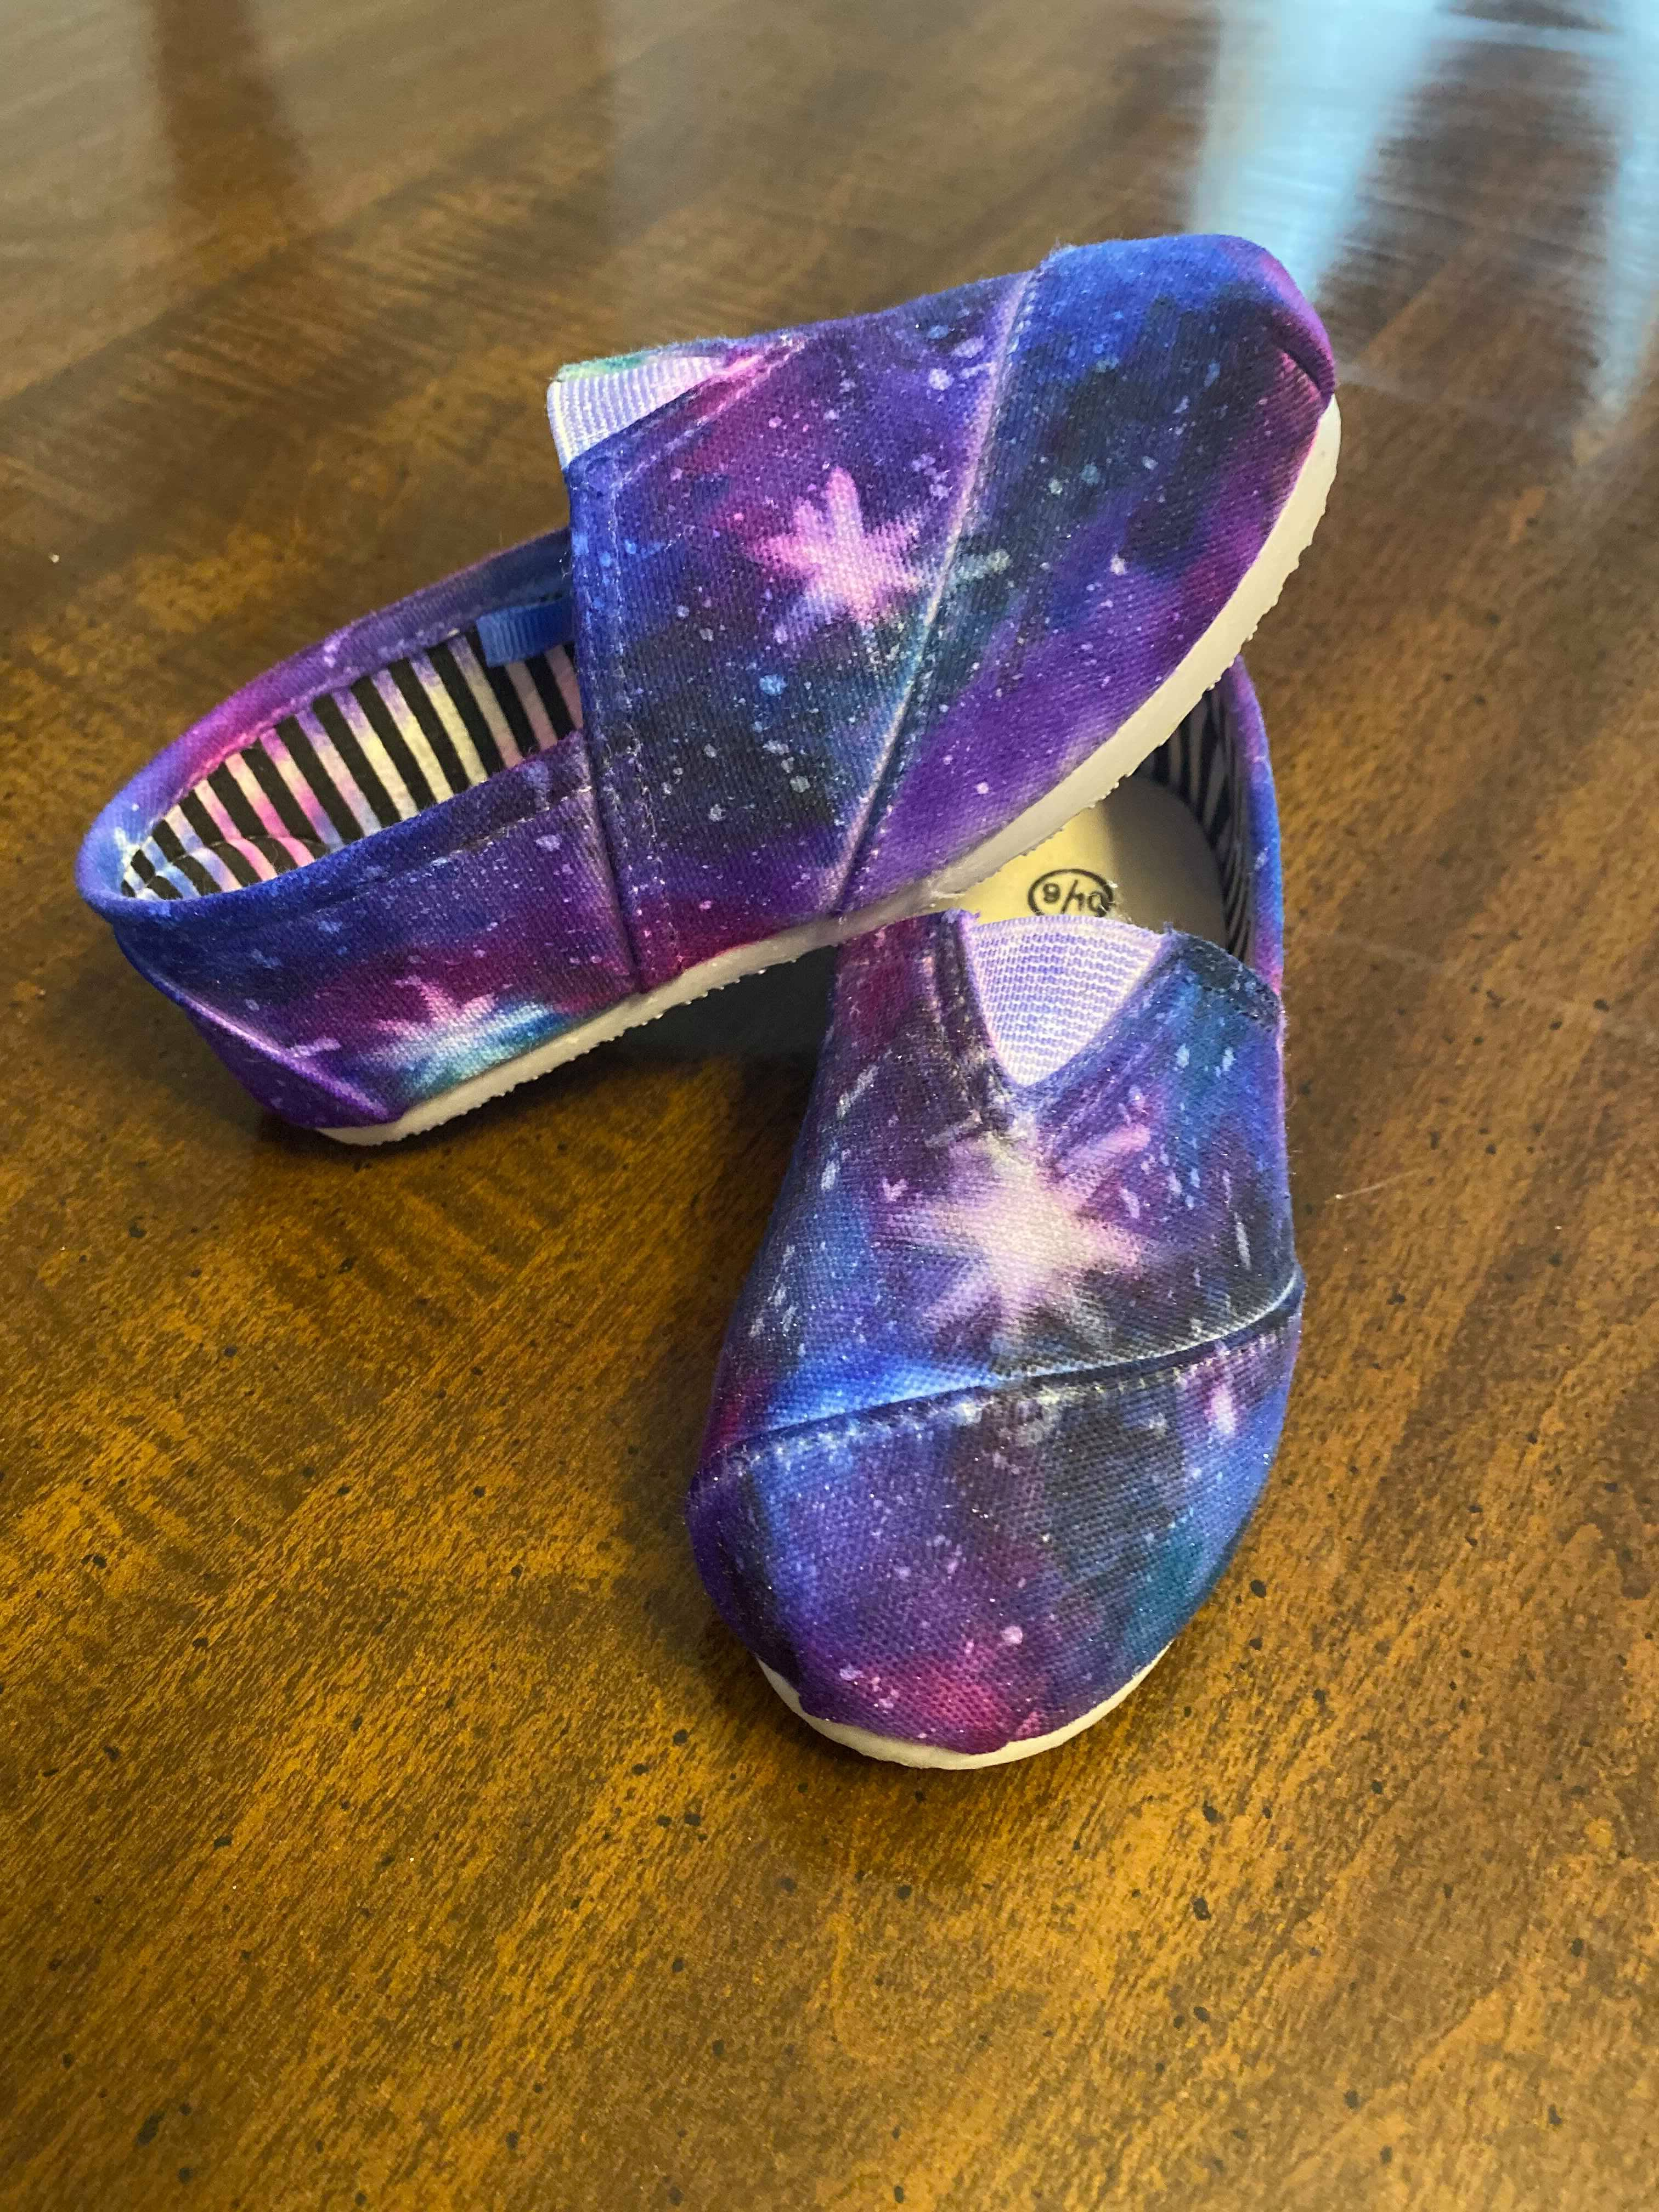 DIY Sharpie Galaxy Shoes : 11 Steps